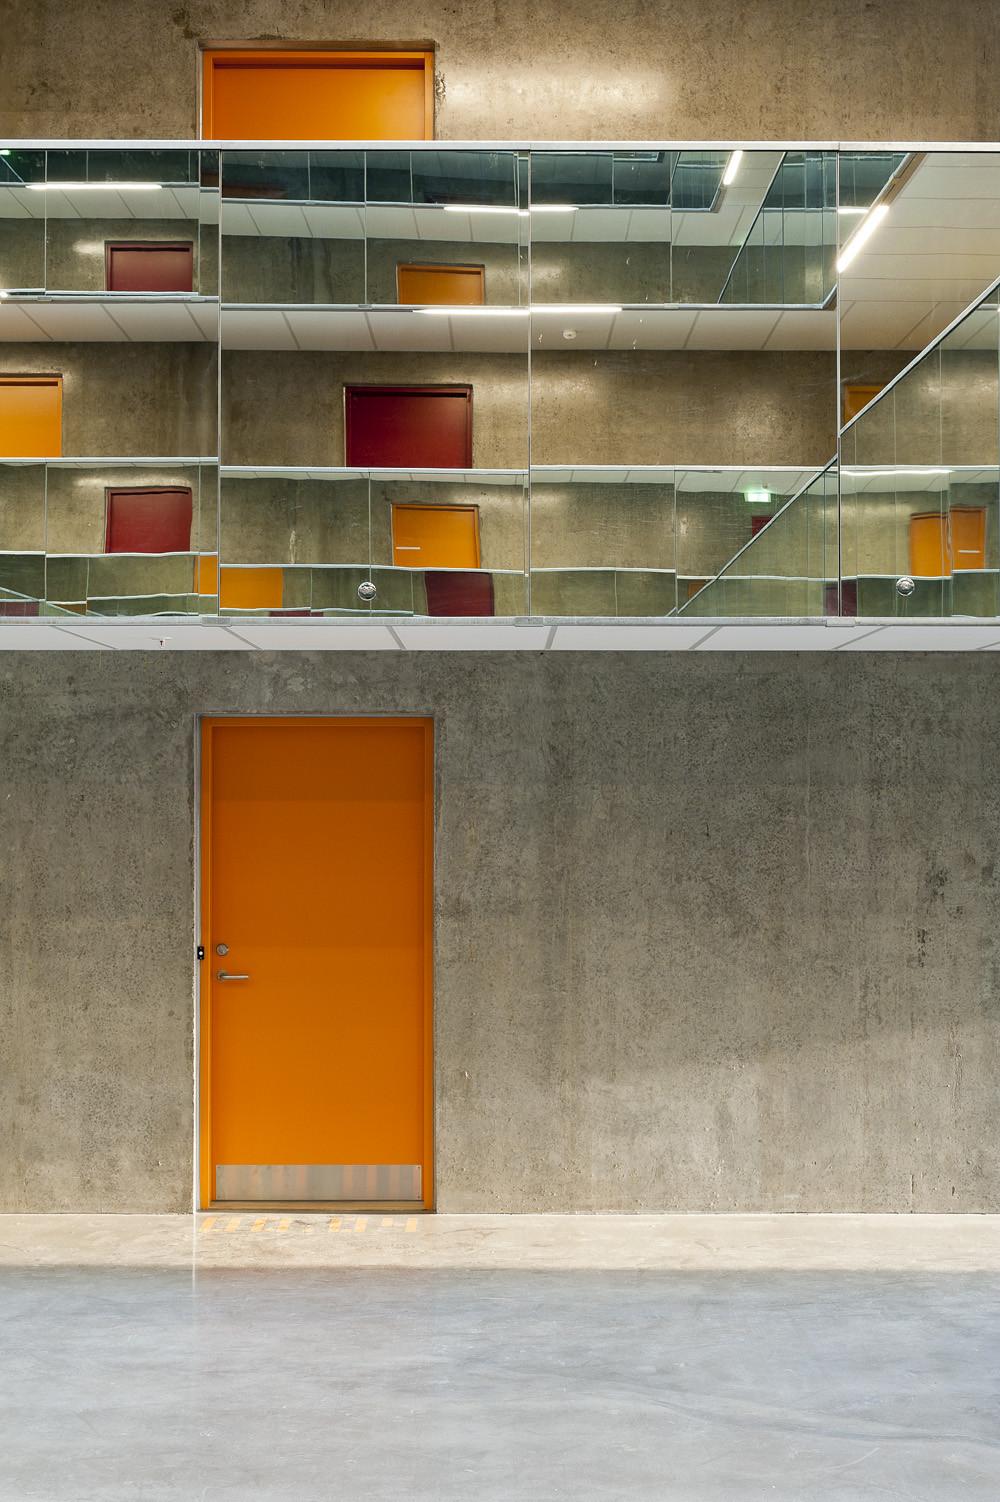 the-tree-mag-grundfos-dormitory-by-cebra-architecture-60.jpg